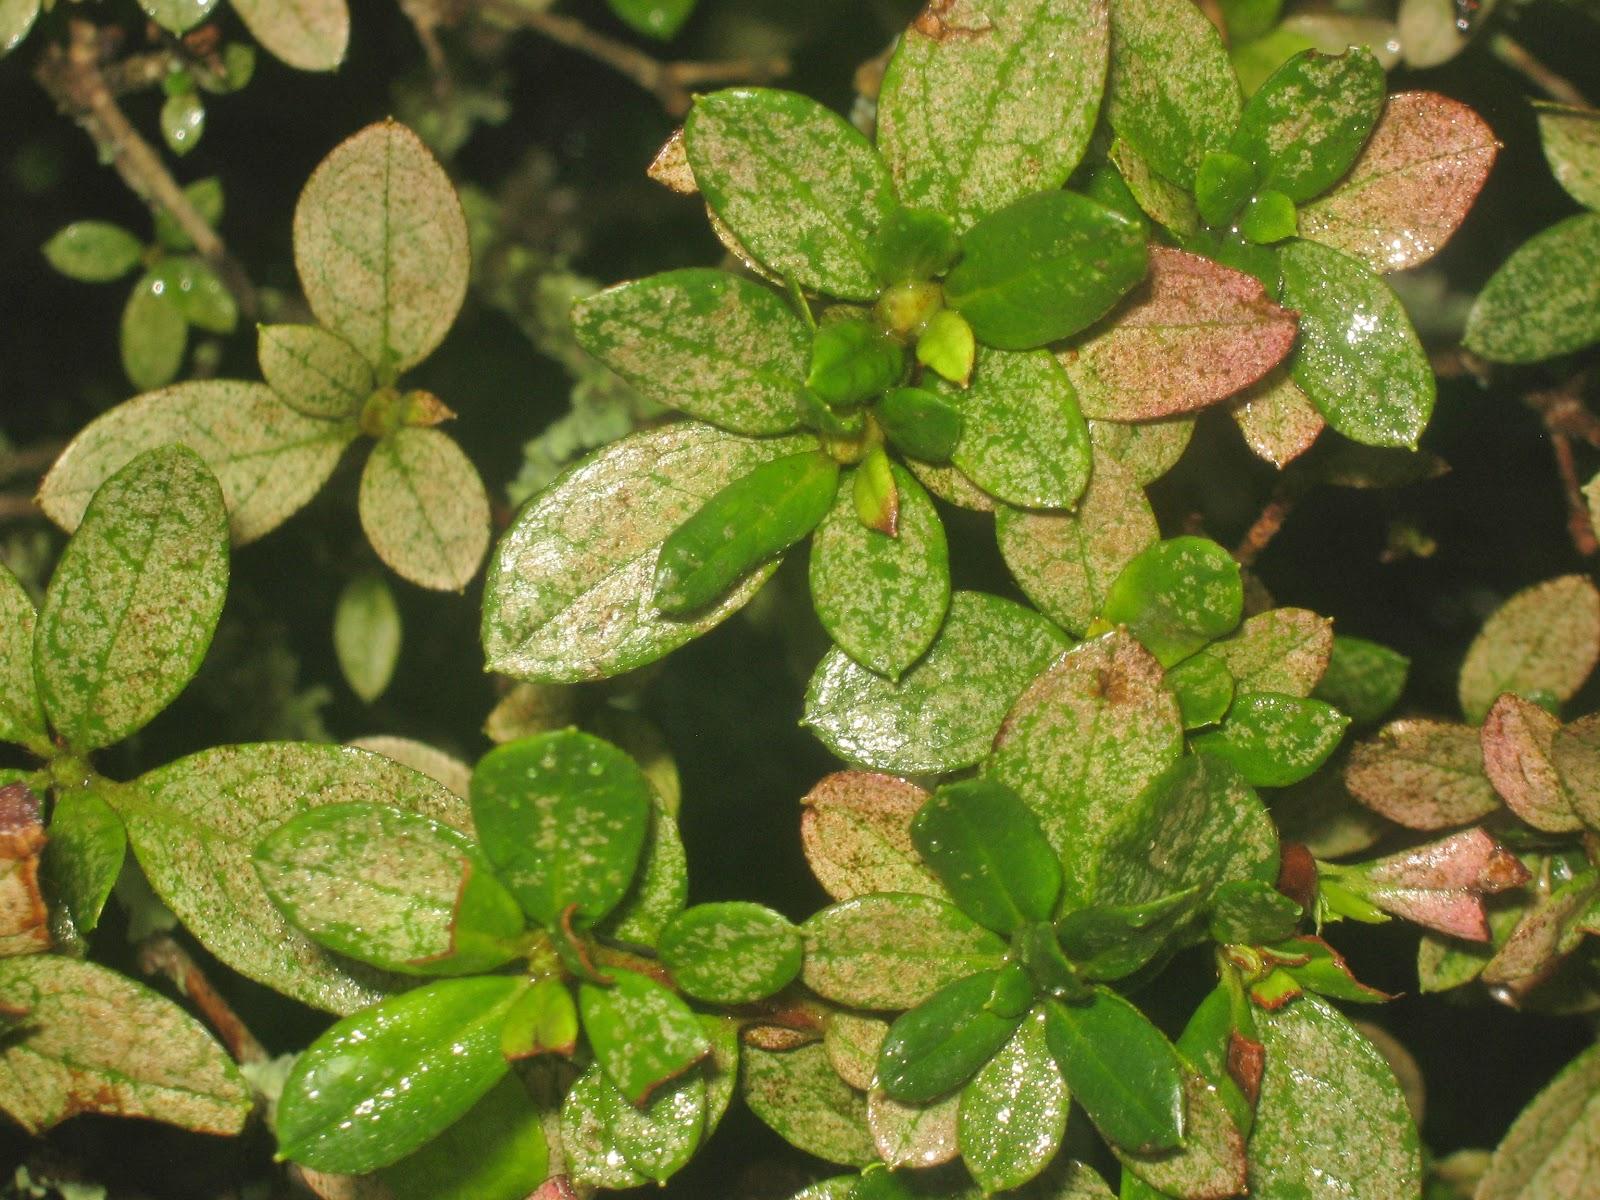 Lace Bug Damage | The Doctor's In! |Azalea Diseases